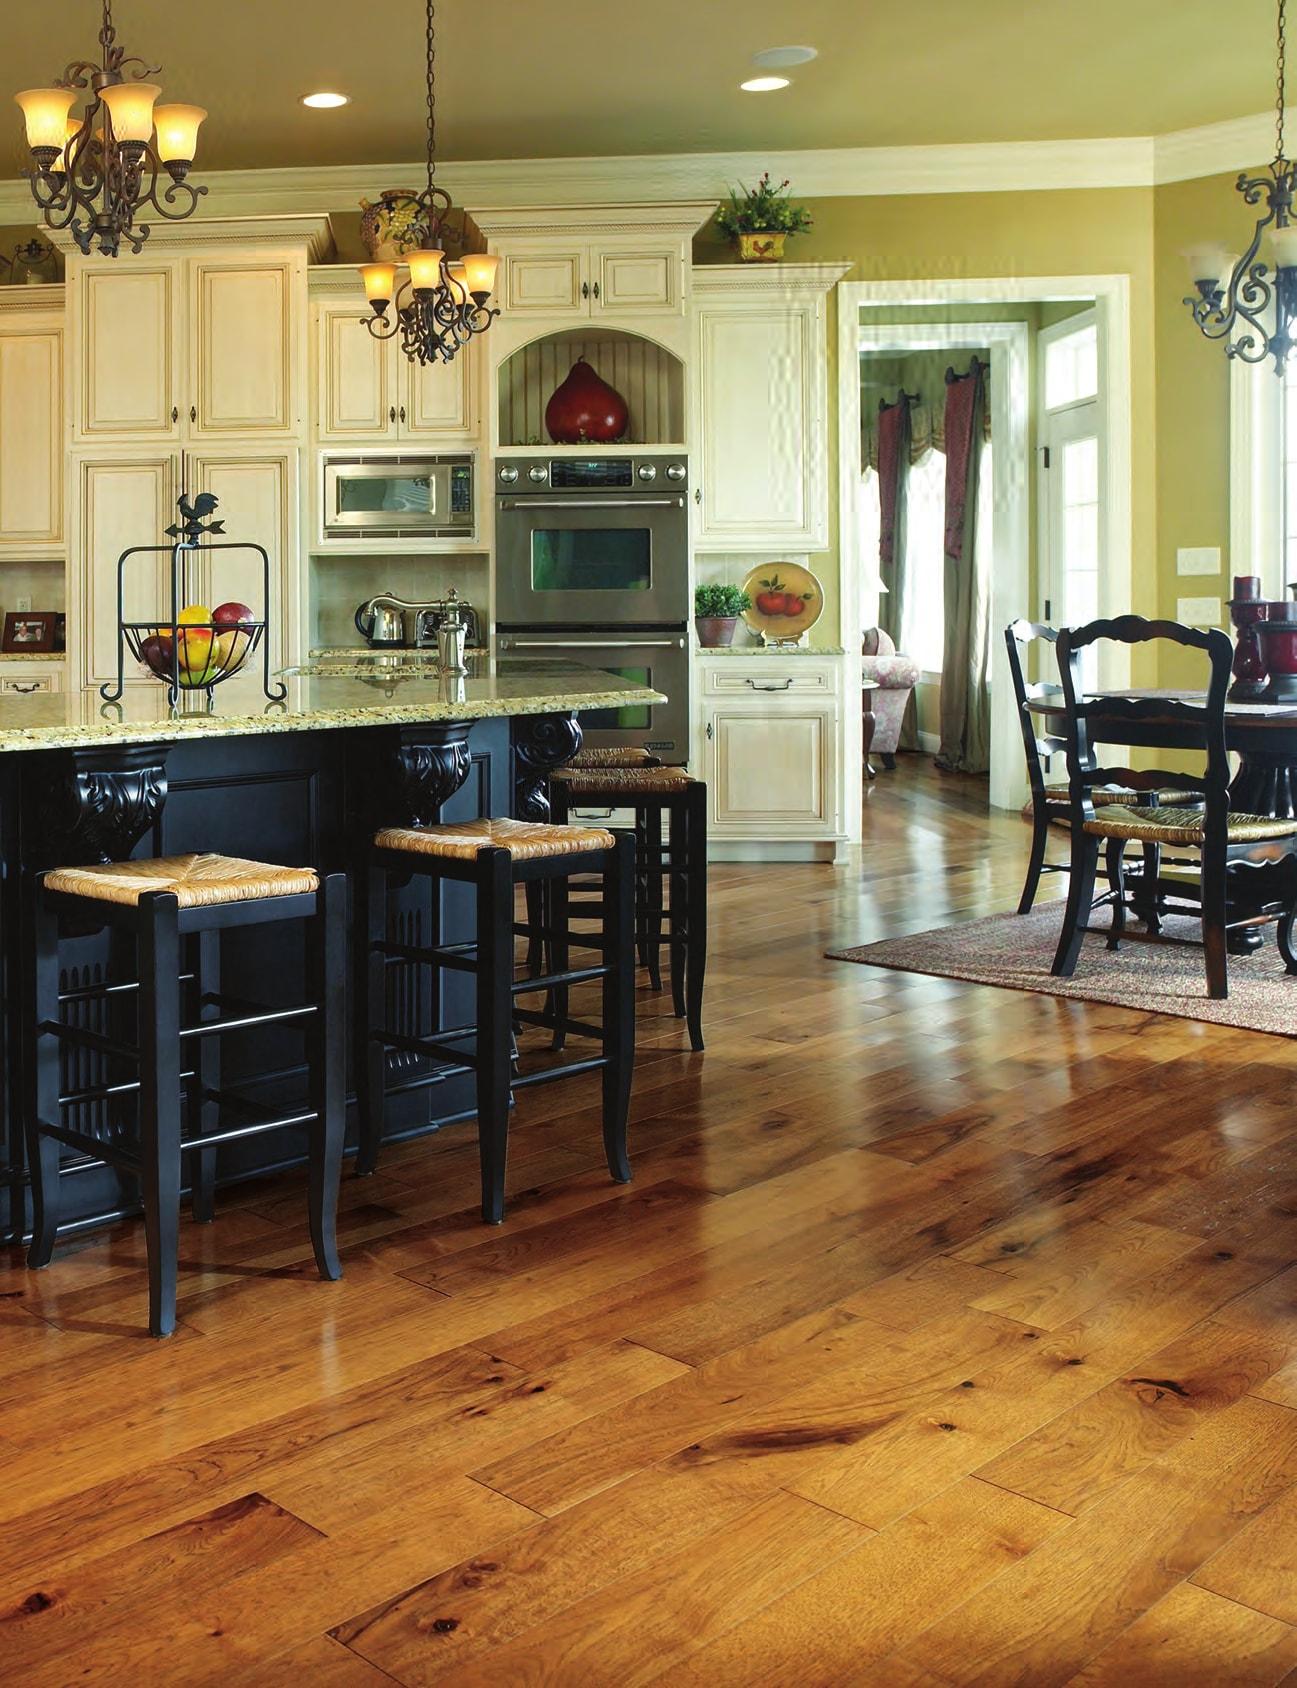 Homer Wood vintage kitchen design with chandelier